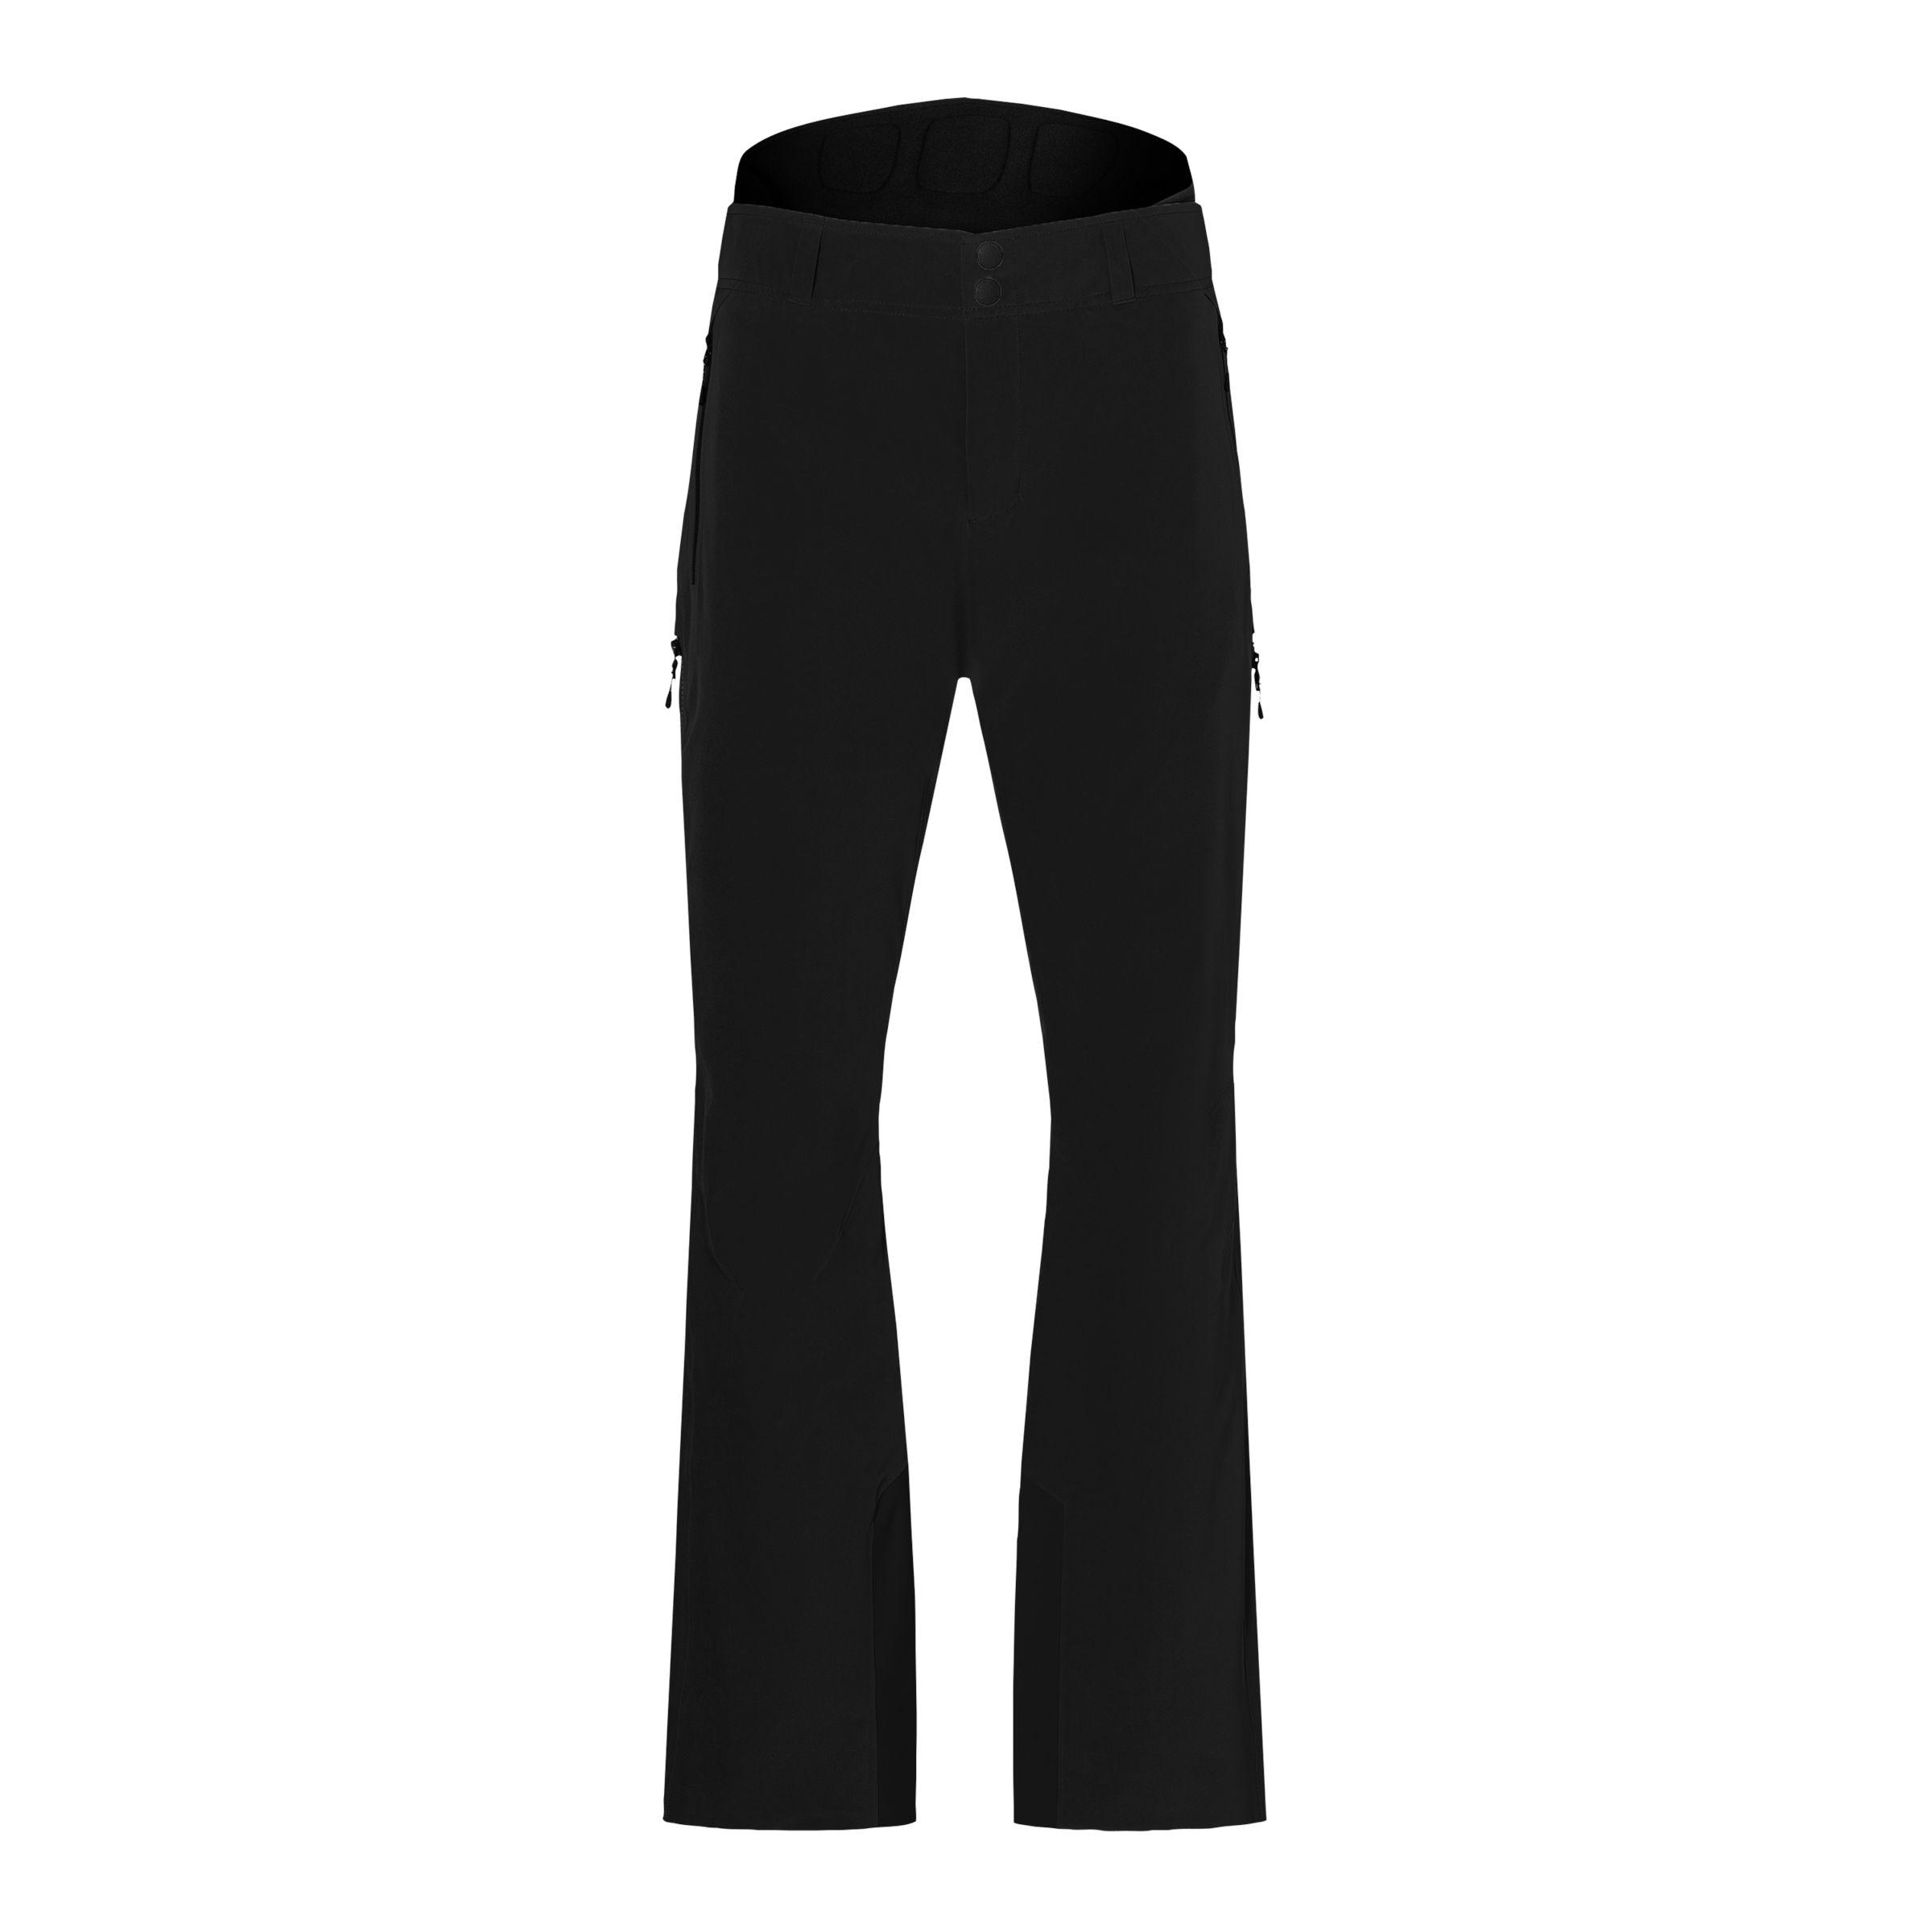 Ski & Snow Pants -  bogner fire and ice NIC Ski Trousers